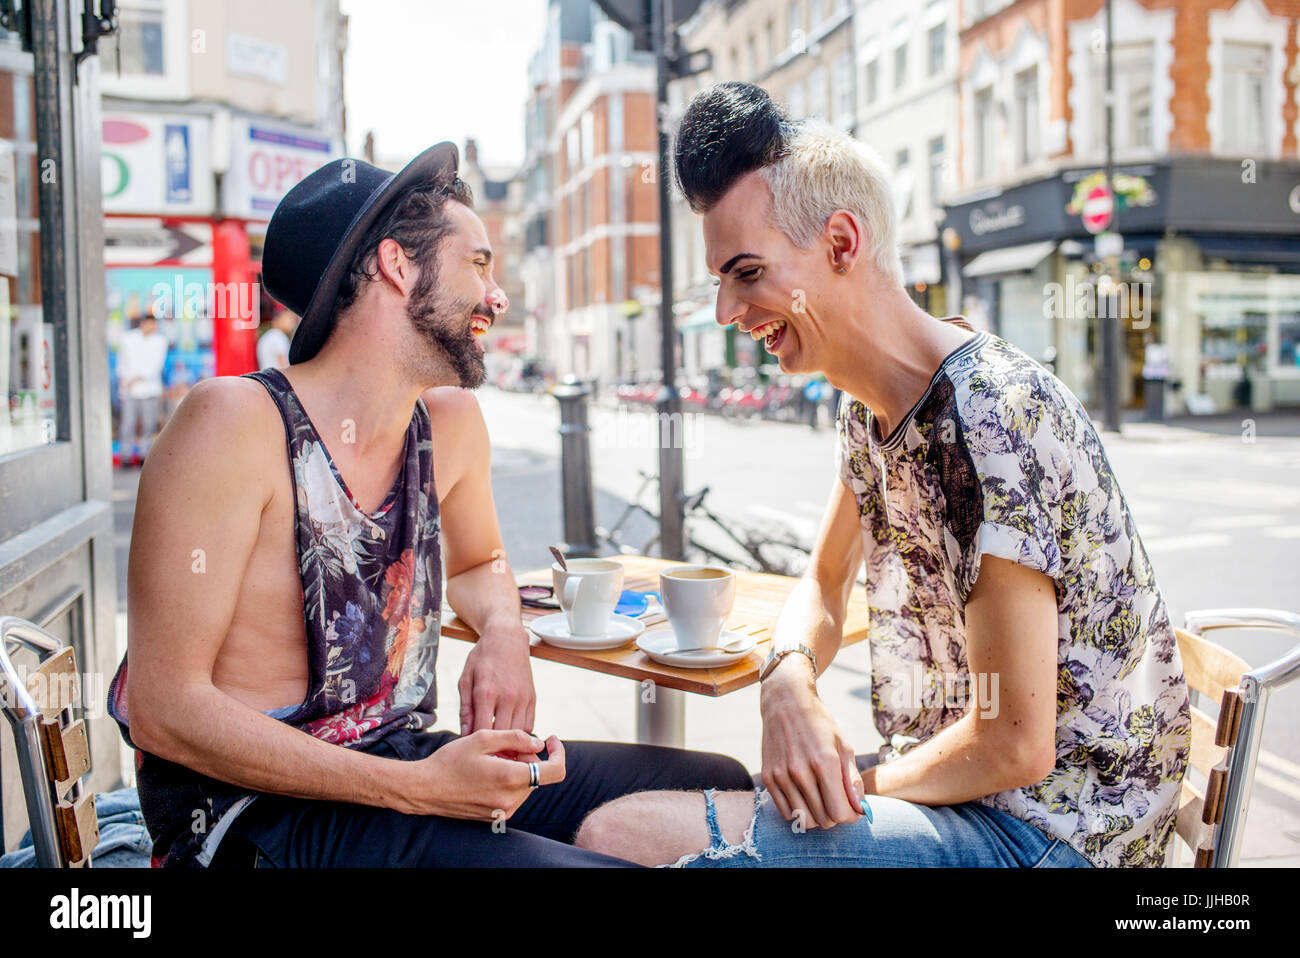 chat gay london